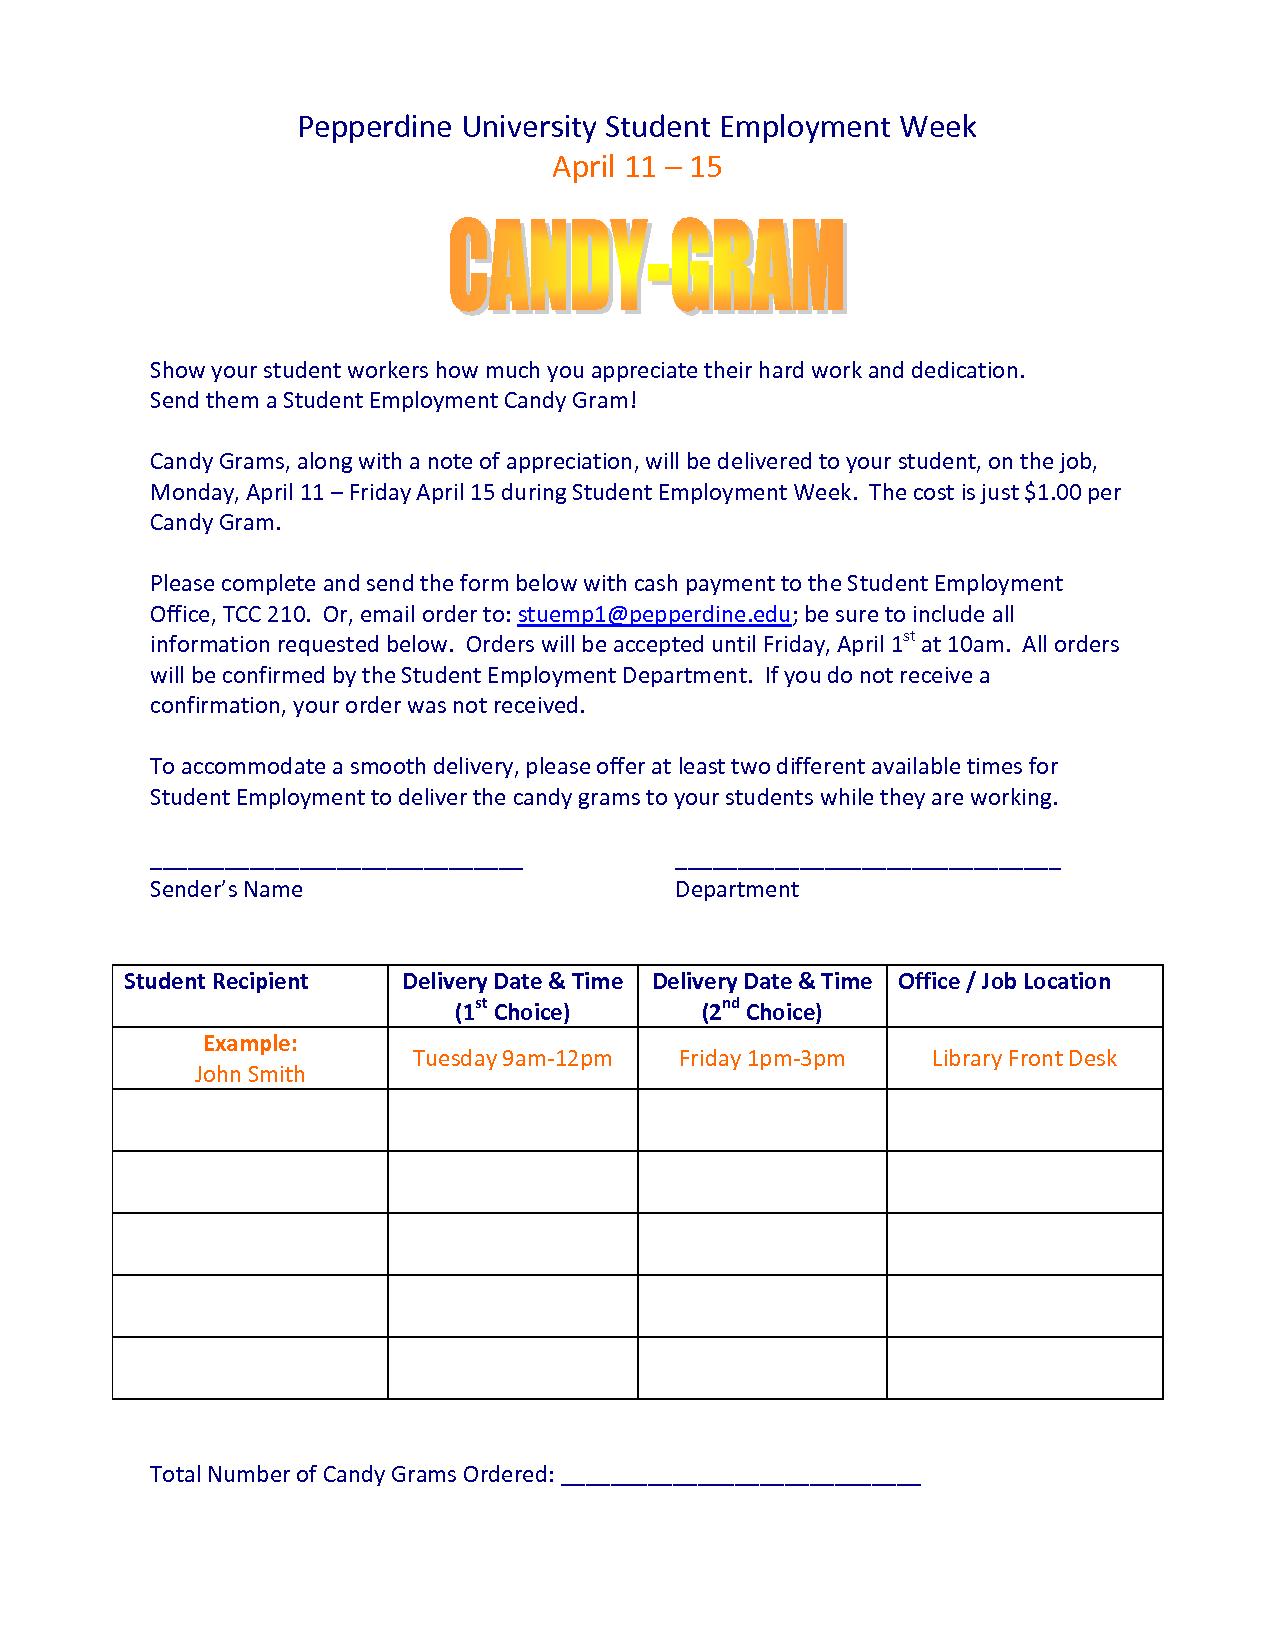 Send them a Student Employment Candy Gram! Description from